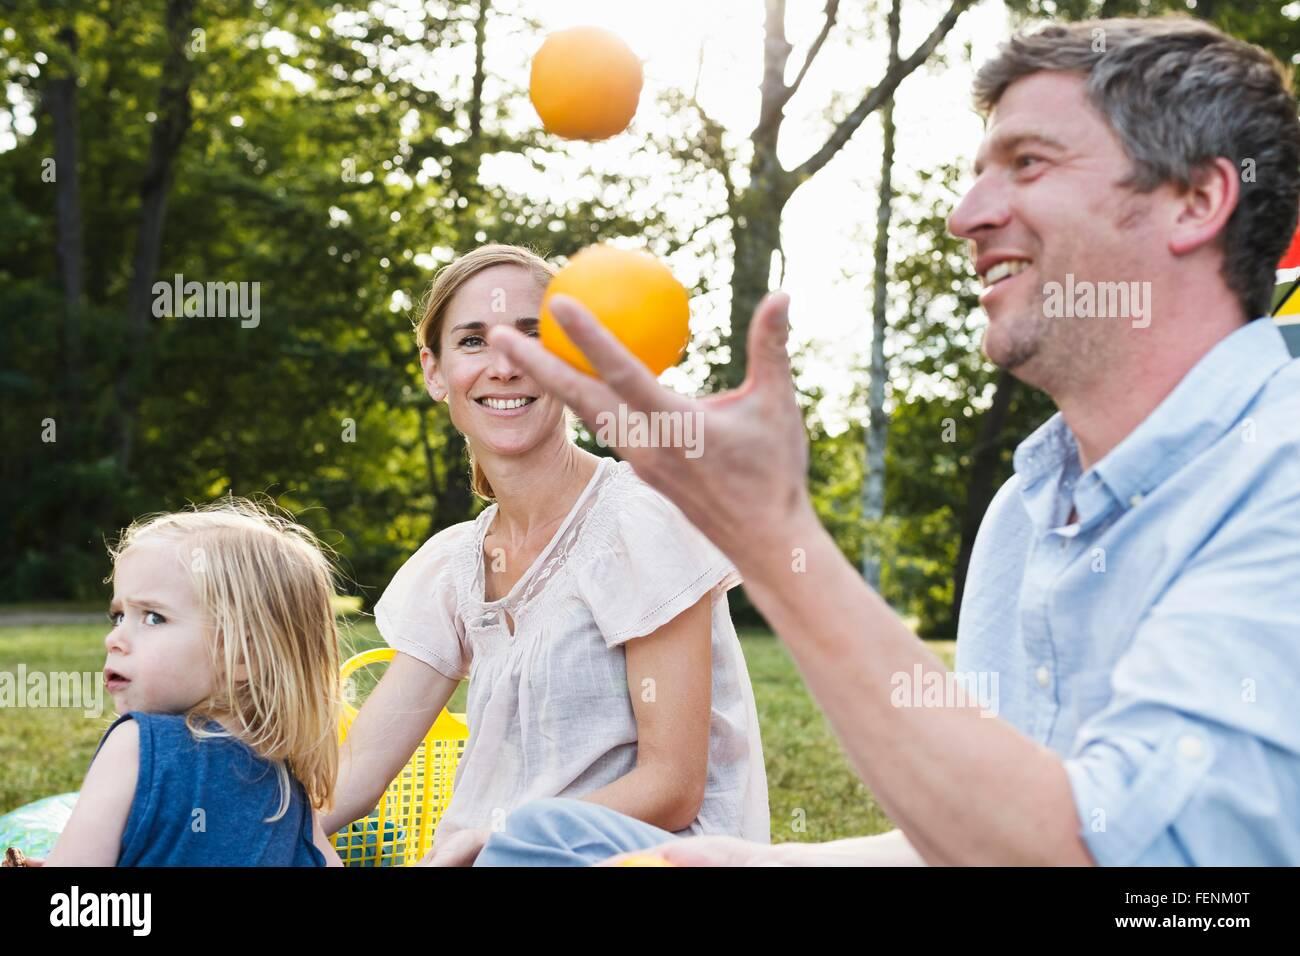 Mature man juggling oranges at family picnic in park - Stock Image